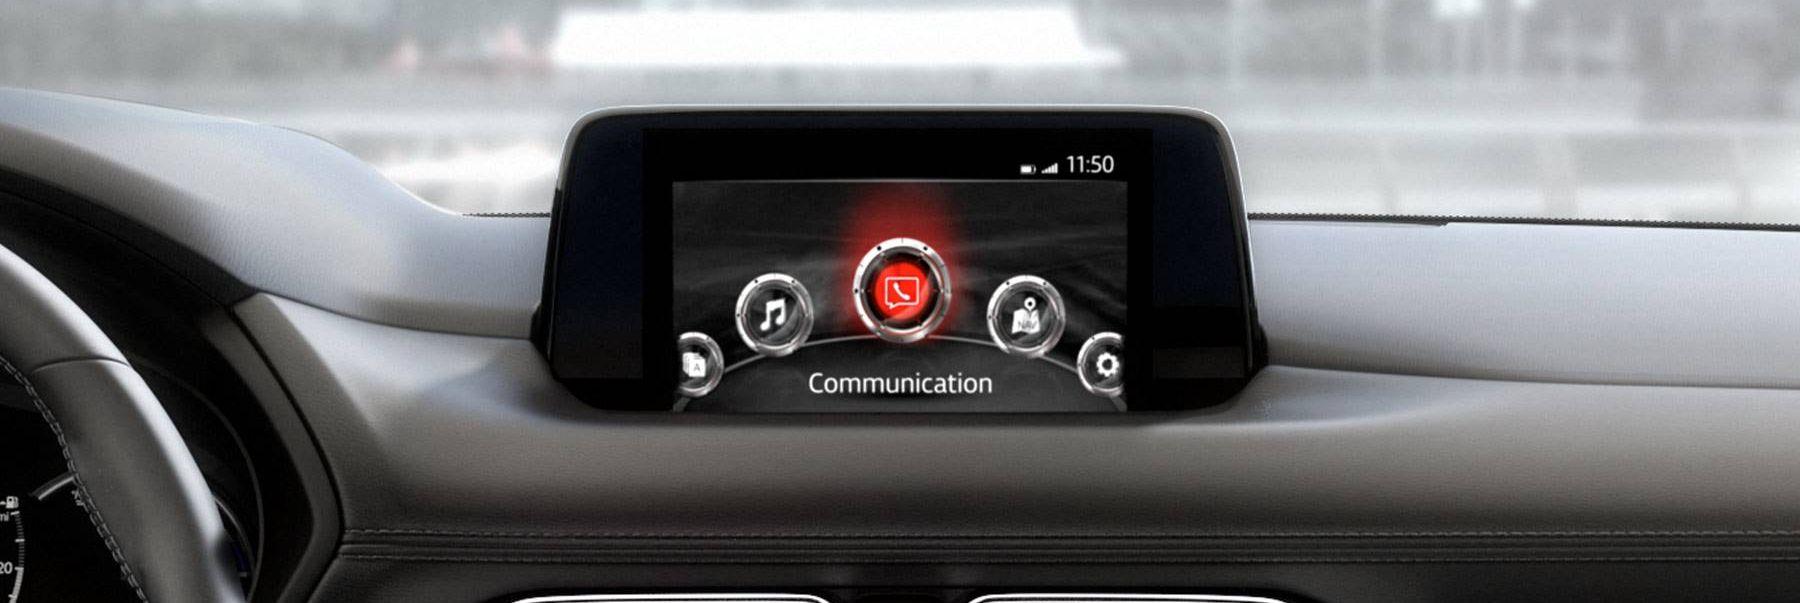 Mazda vs Toyota Technology Features near Sacramento, CA